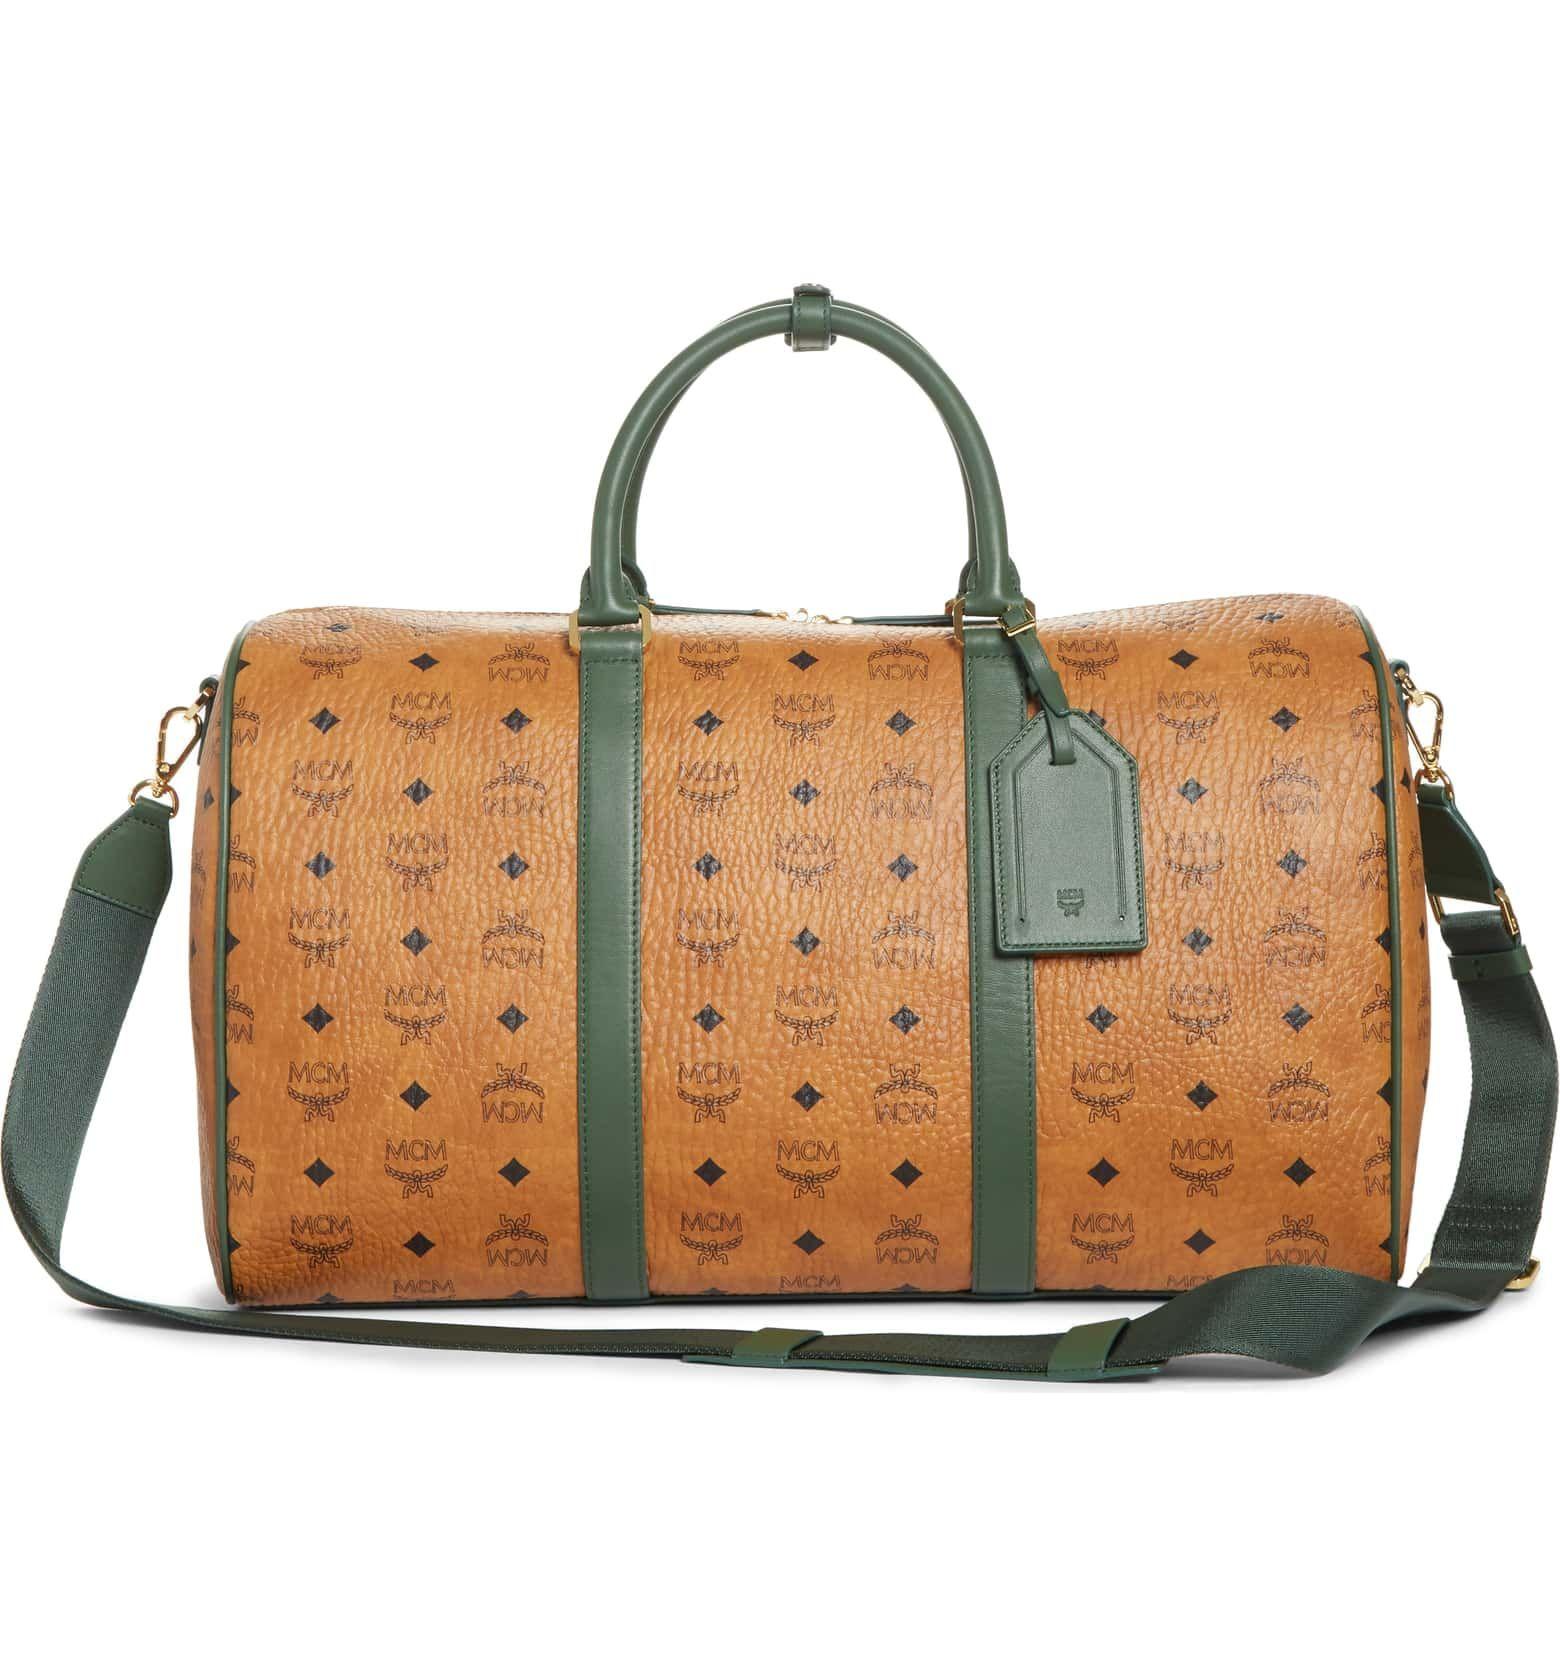 2efb5e710 #MCM Visetos Weekend Medium Bag in cognac and safari green | Patterned in  MCM's signature Visetos print, this striking duffel is cut with a sleek, ...